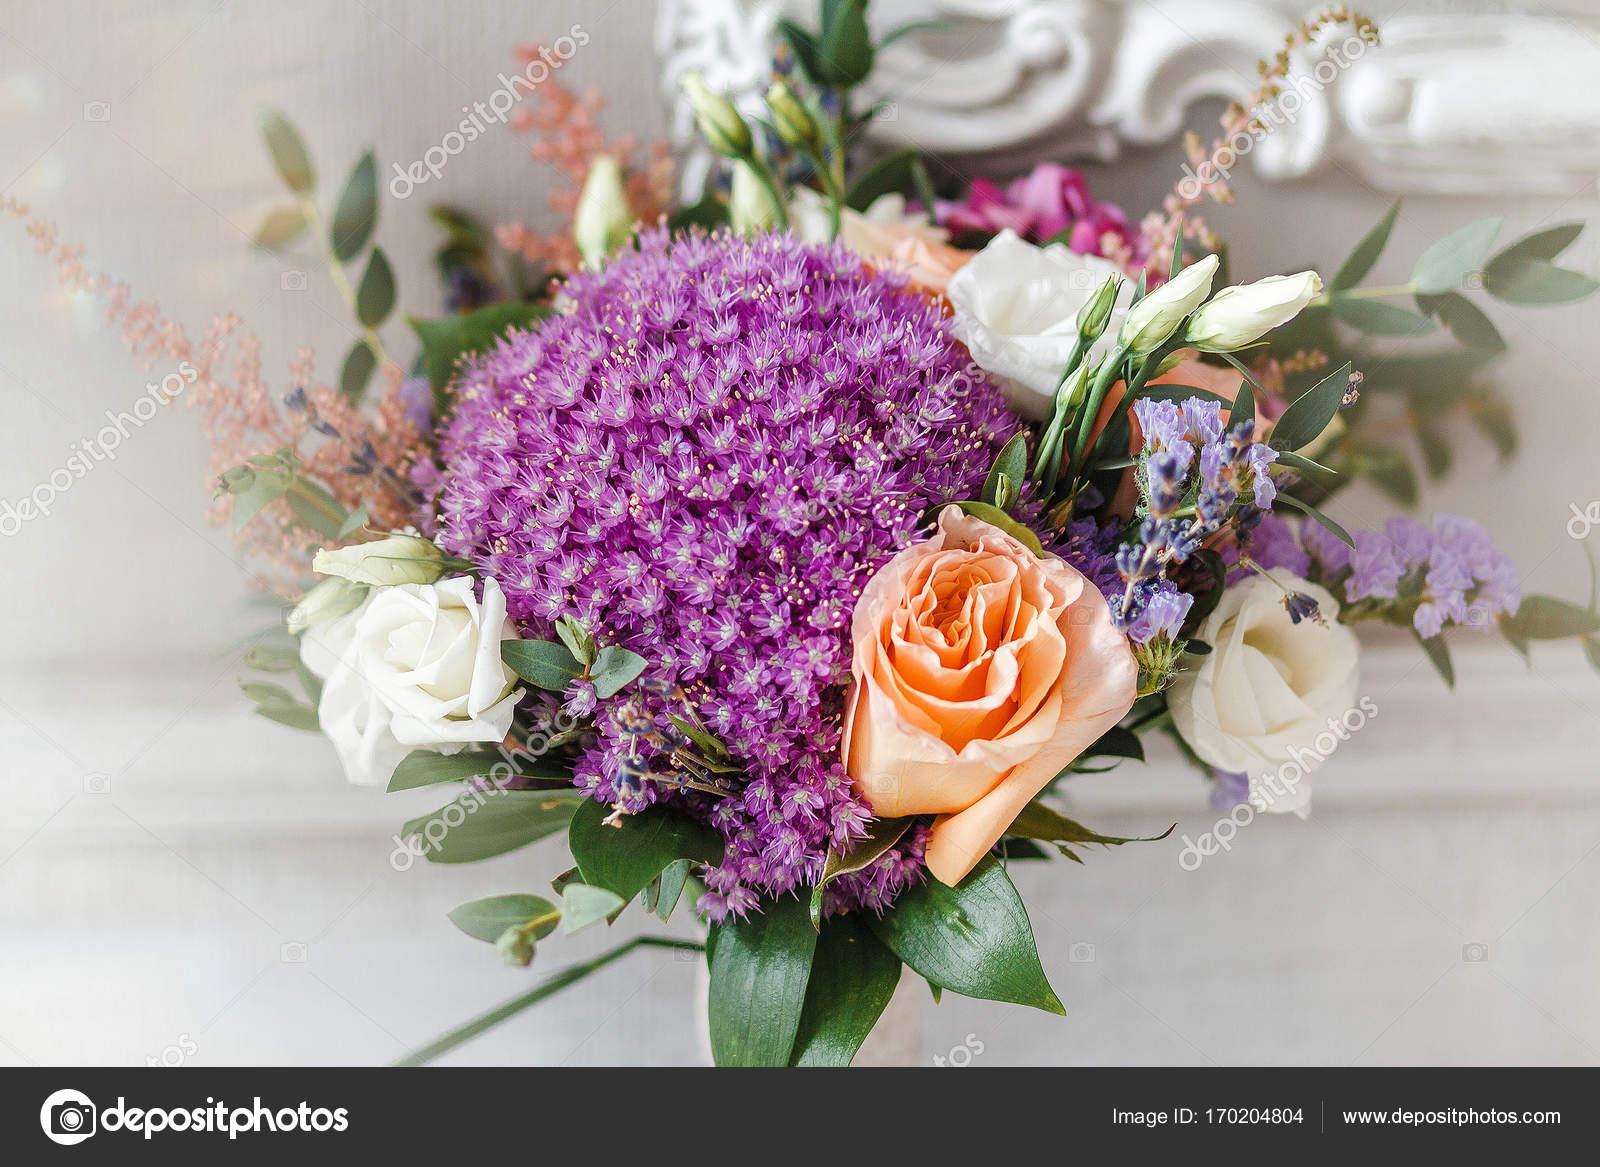 Beautiful purple wedding flowers bouquet stock photo frantic00 beautiful purple wedding flowers bouquet photo by frantic00 izmirmasajfo